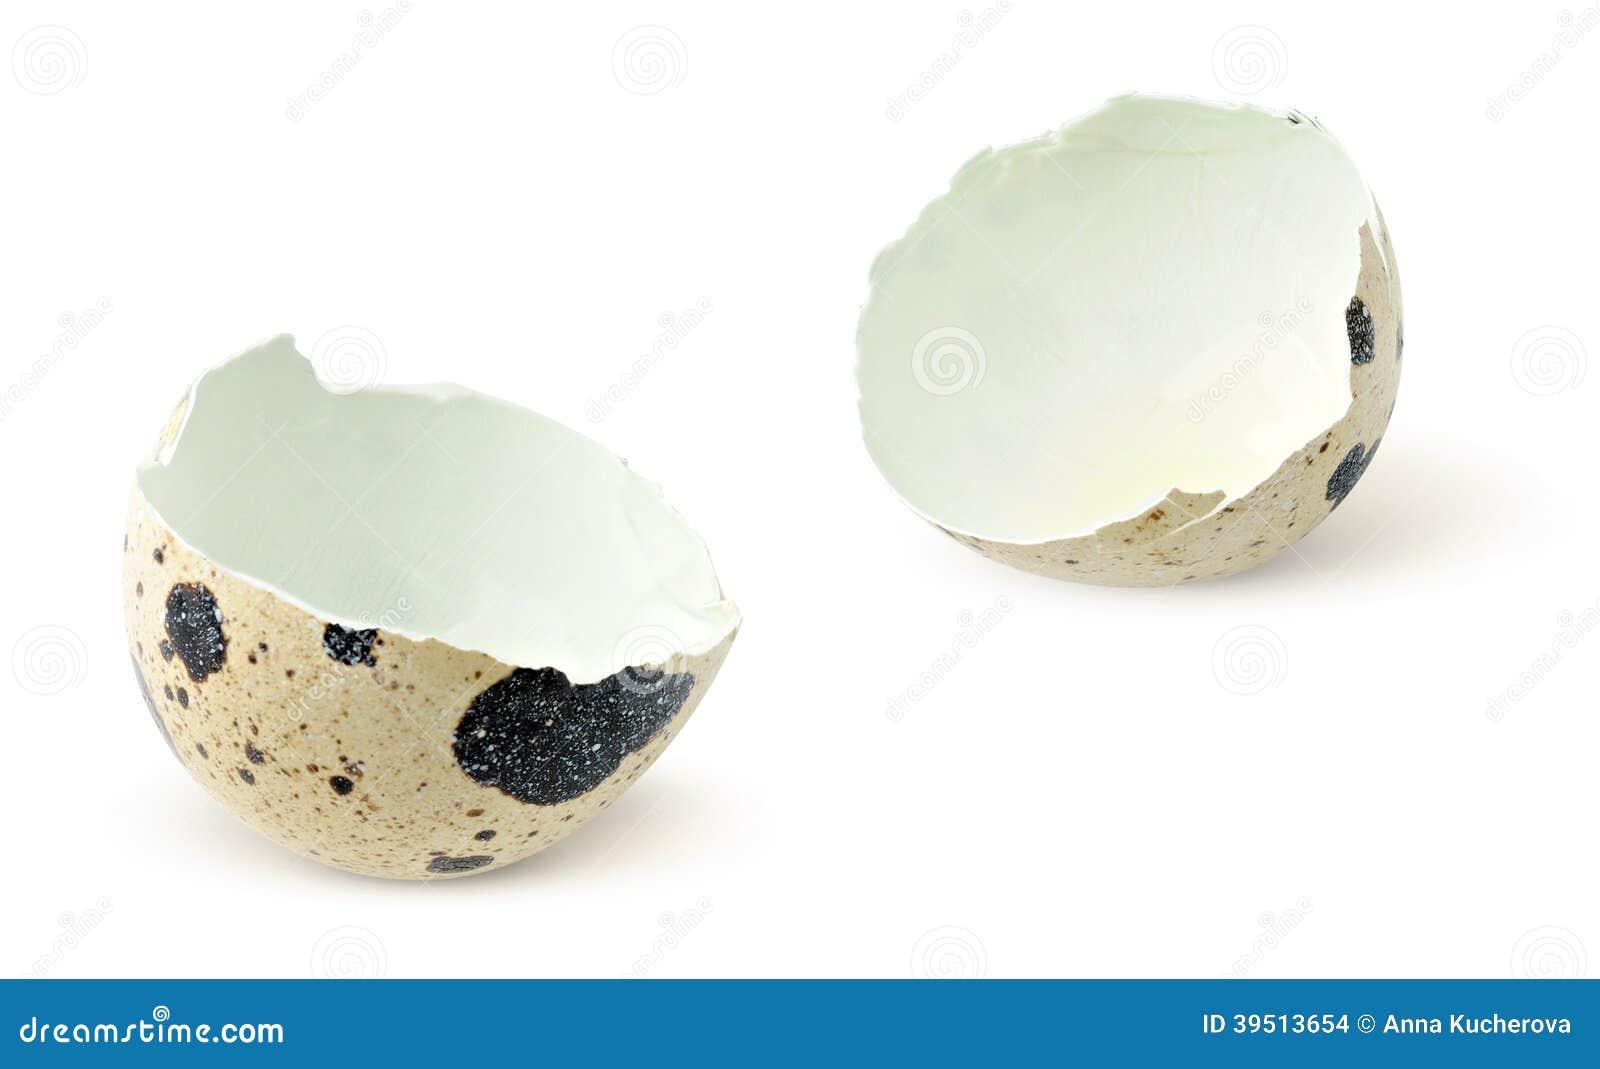 Quail eggshells